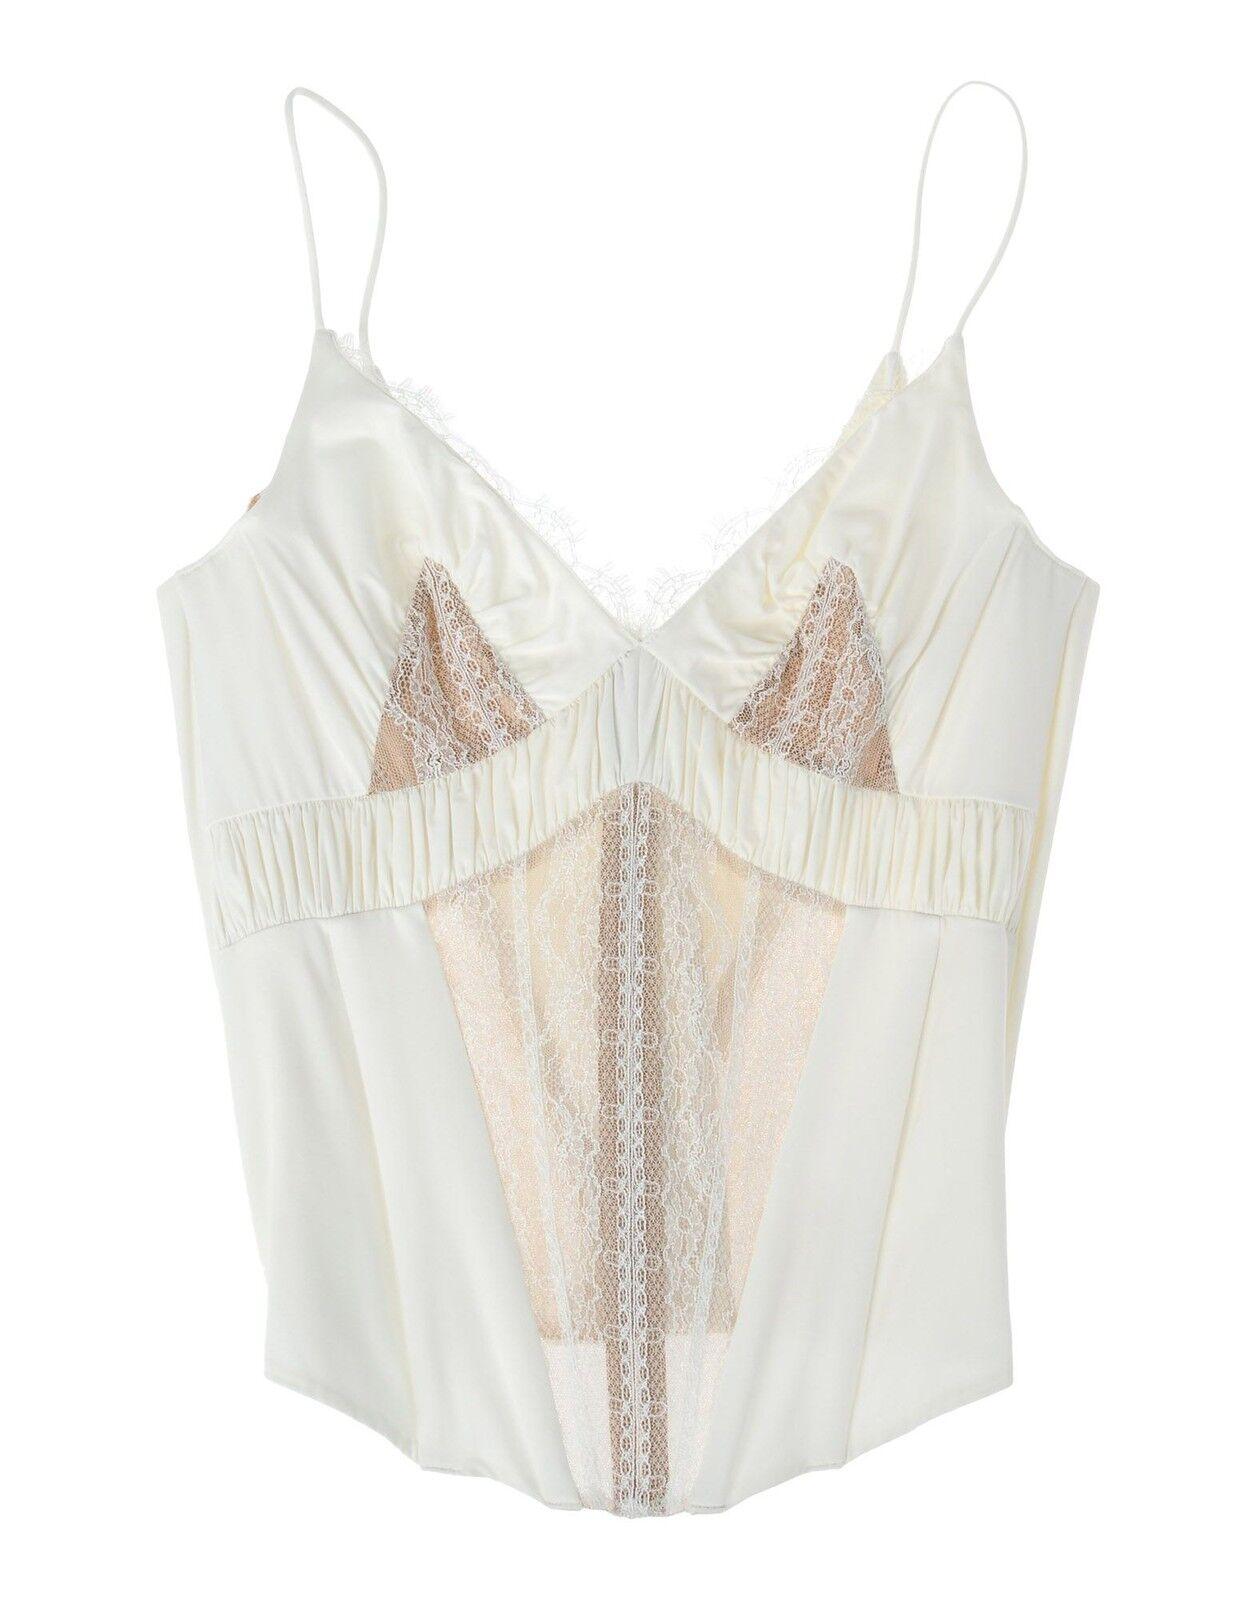 La Perla Treasure Collection Ivory Lace Victorian Style Bustier Cami Top 34B